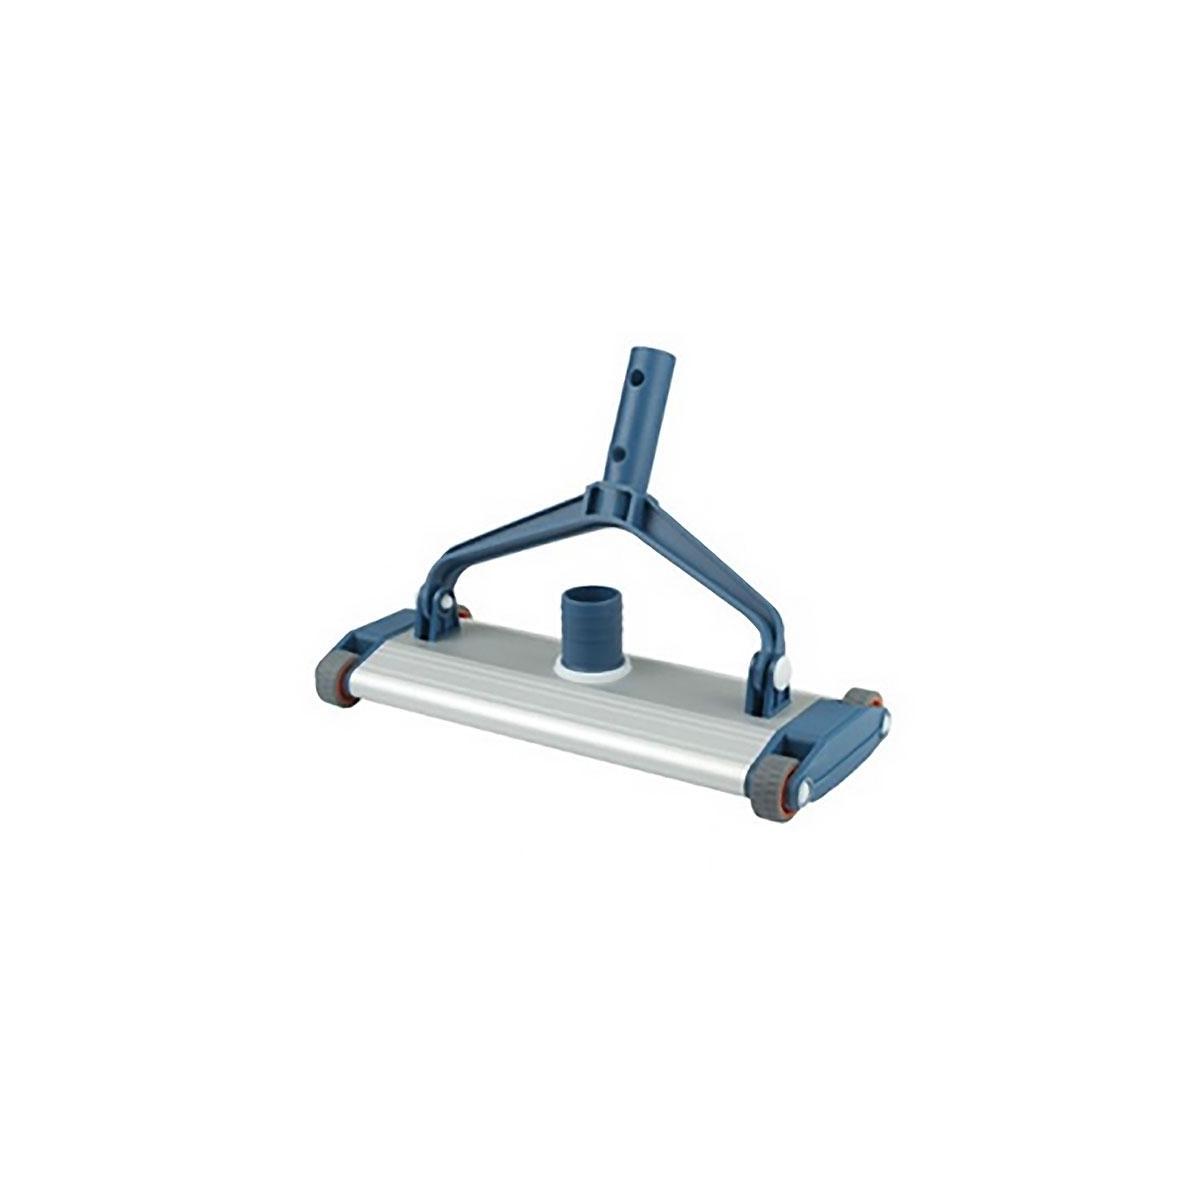 Limpiafondos manual aluminio Astralpool Blue Line